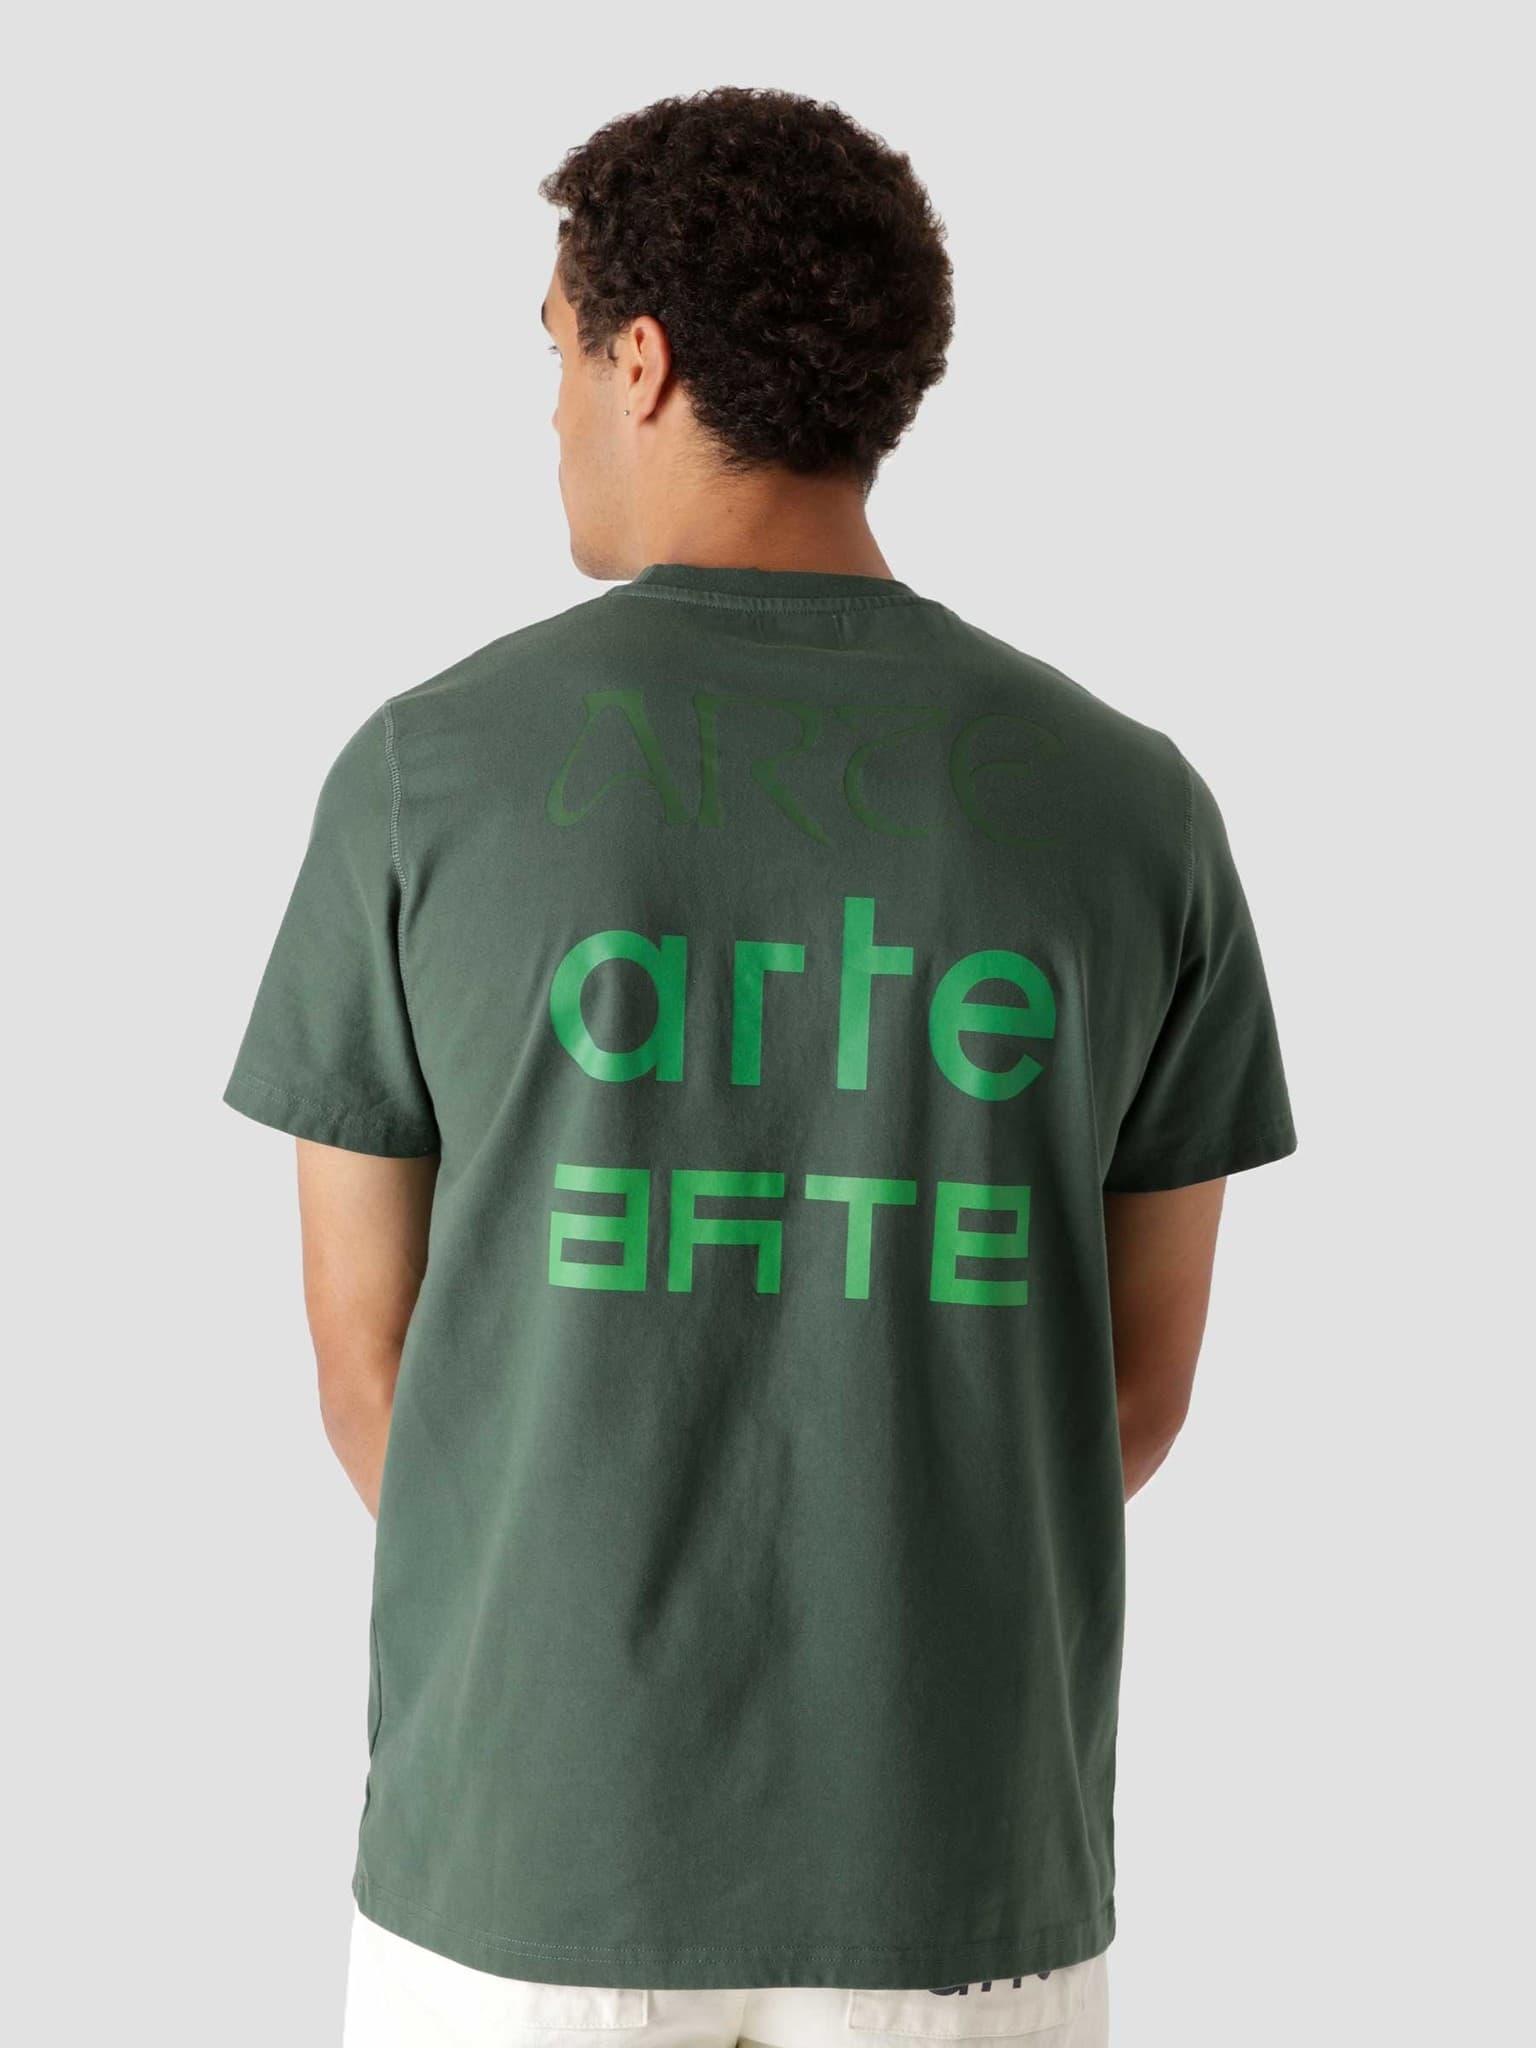 Tissot Back Multi Logo T-Shirt Green AW21-073T2